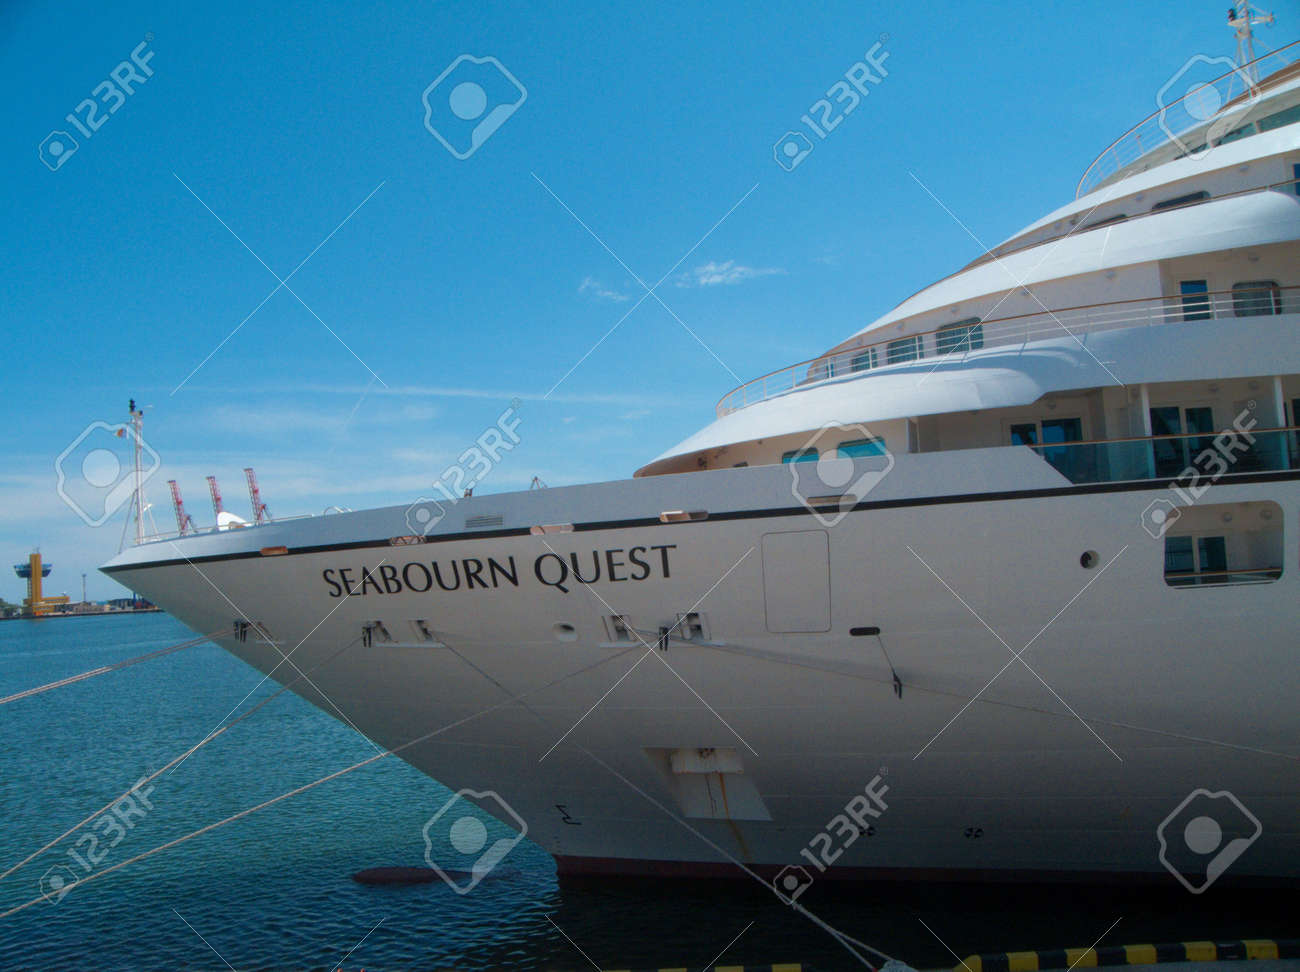 ODESSA, UKRAINE - May 21,2012: Passenger ship M/V Seabourn Quest (Built: 2011, Flag: Bagamas) visit Port of Odessa on 21 May, 2012 in Odessa, Ukraine. Stock Photo - 13744463